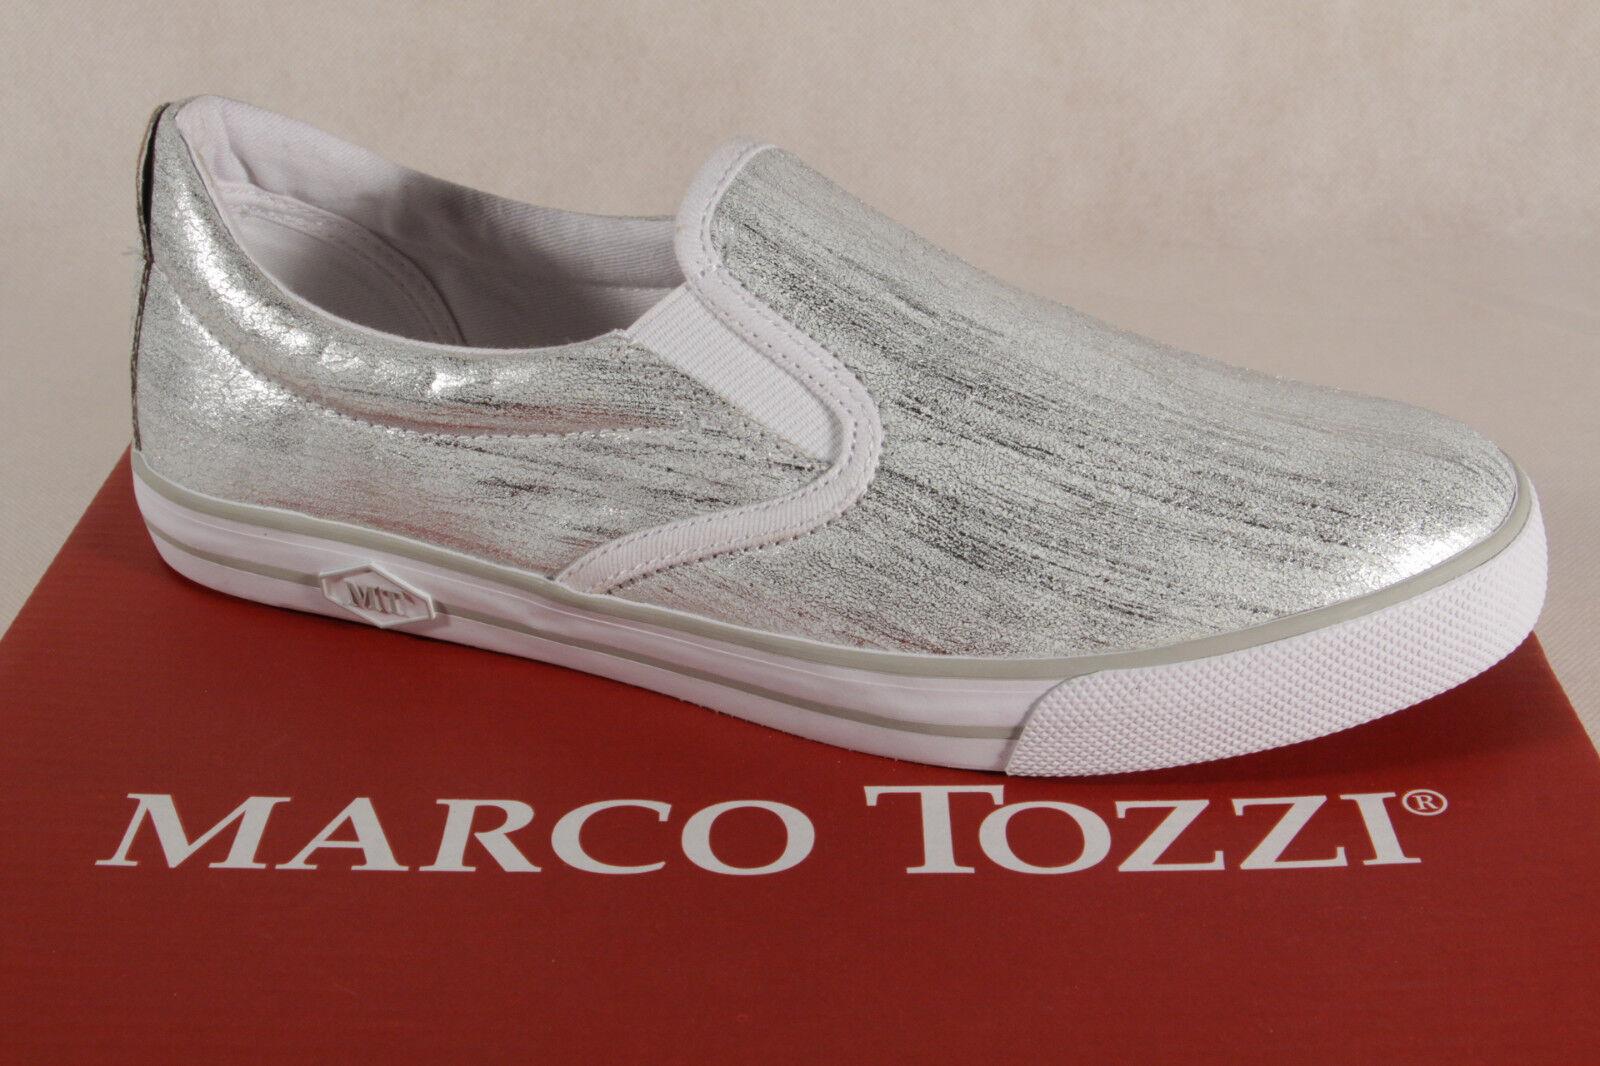 Marco Tozzi Zapatillas Zapatillas Zapatillas Mujer Bailarinas Plata 24611 Nuevo  minoristas en línea